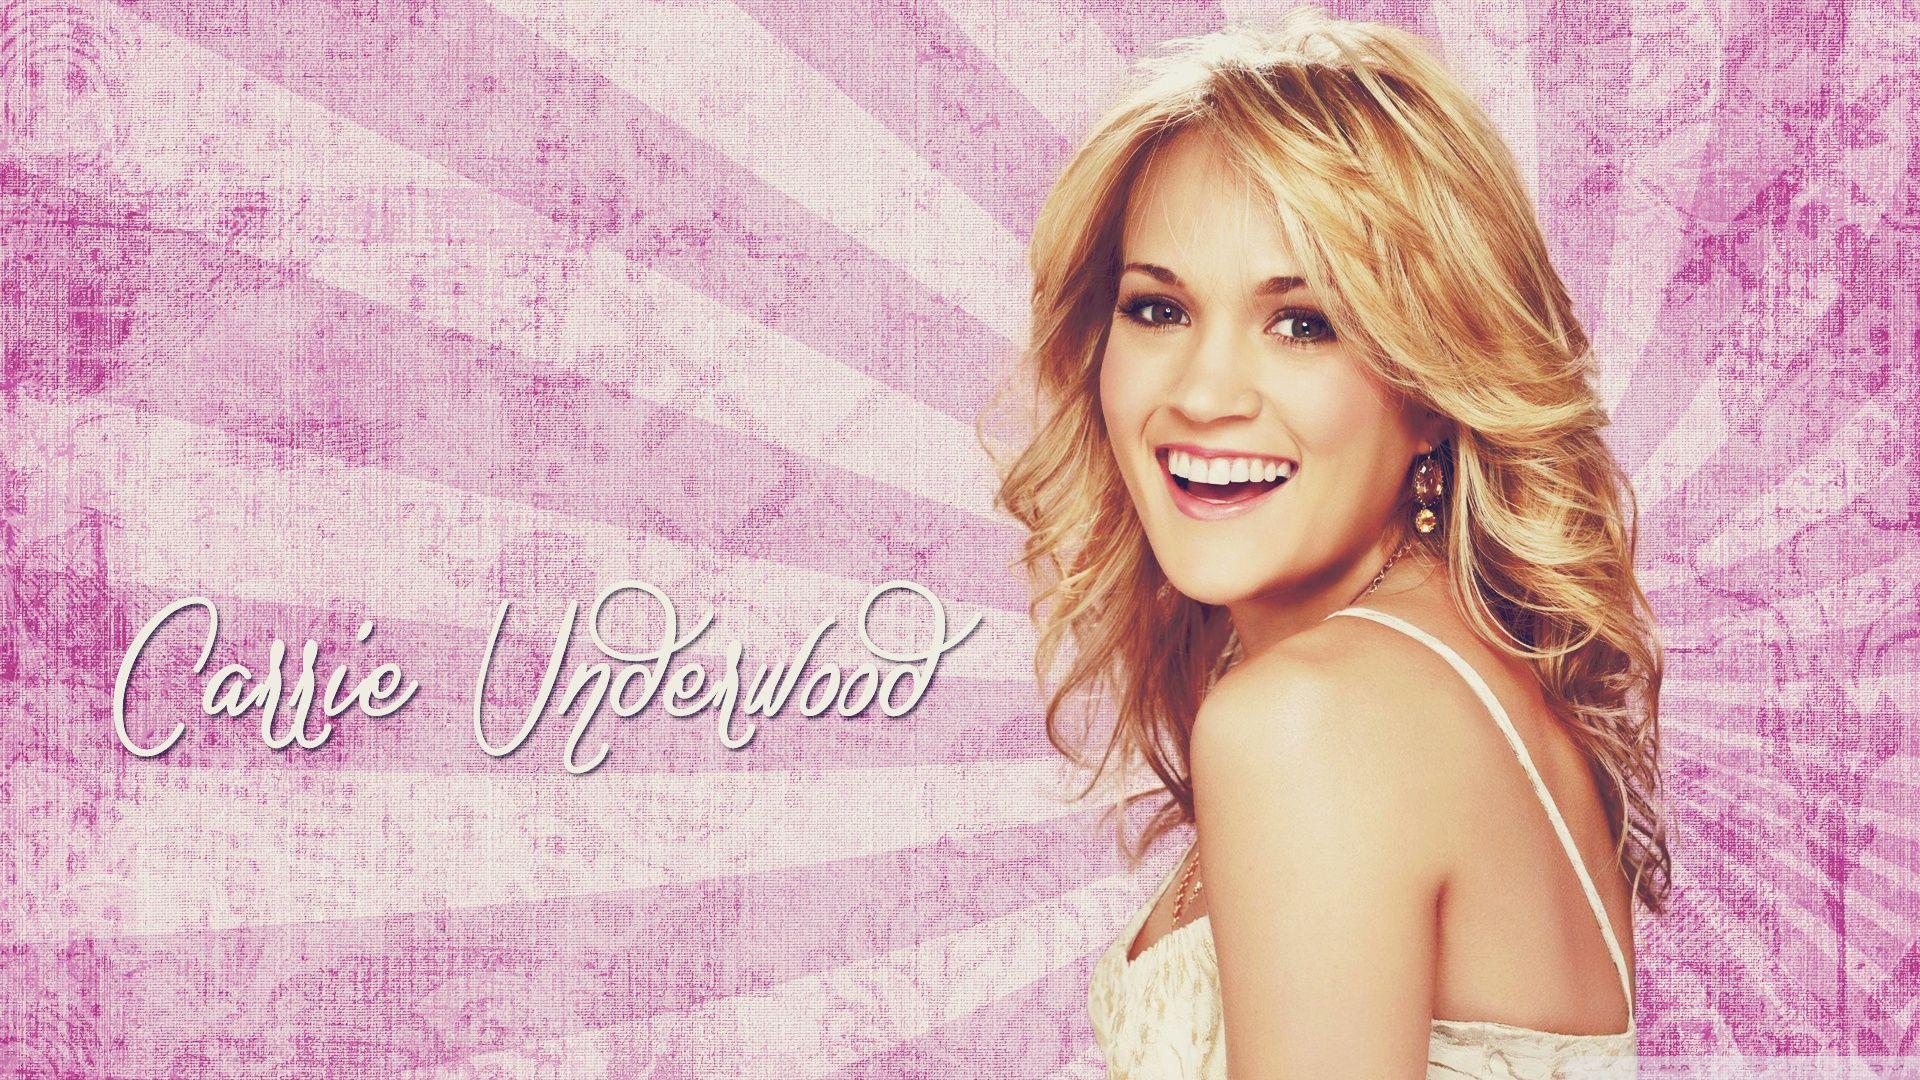 Carrie Underwood Carrie Underwood Hd Wallpapers For Pc Hd Wallpaper Desktop